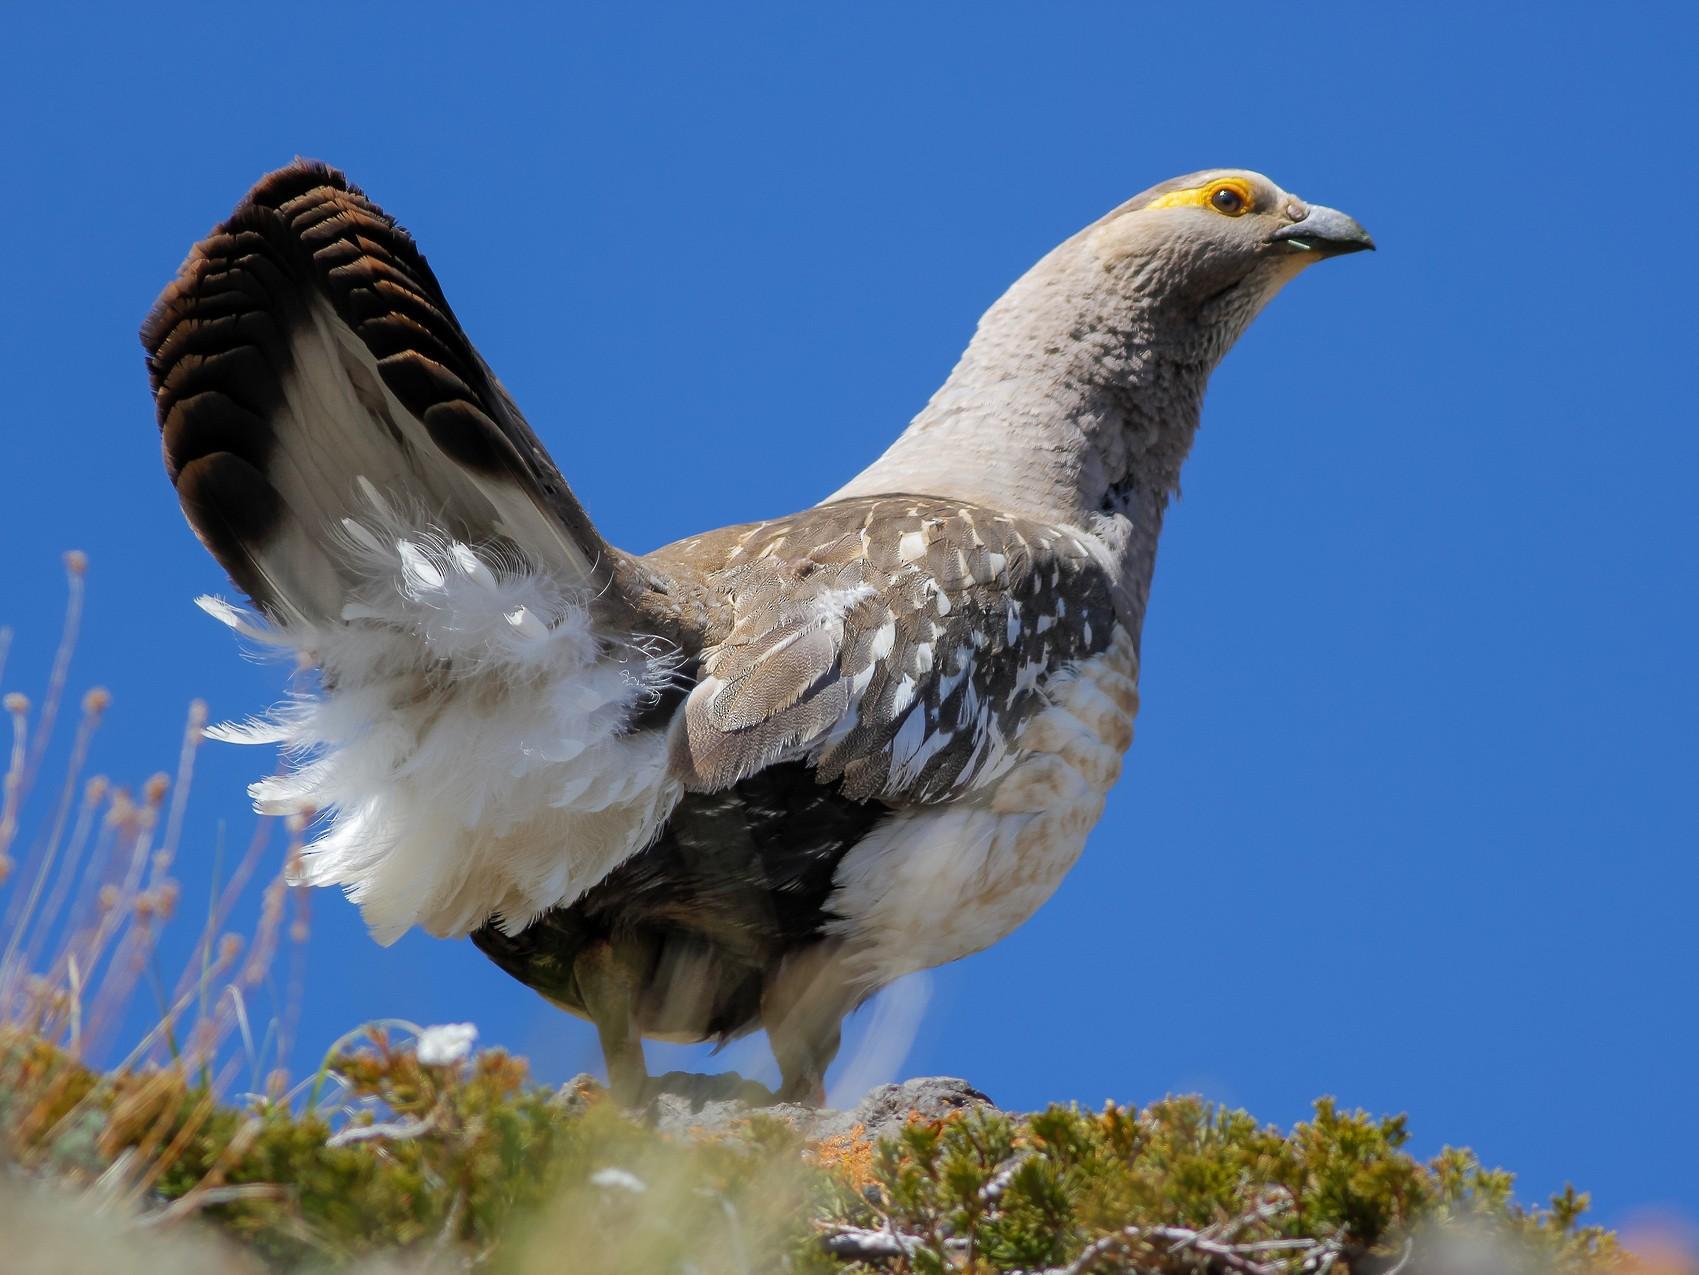 Altai Snowcock - Purevsuren Tsolmonjav